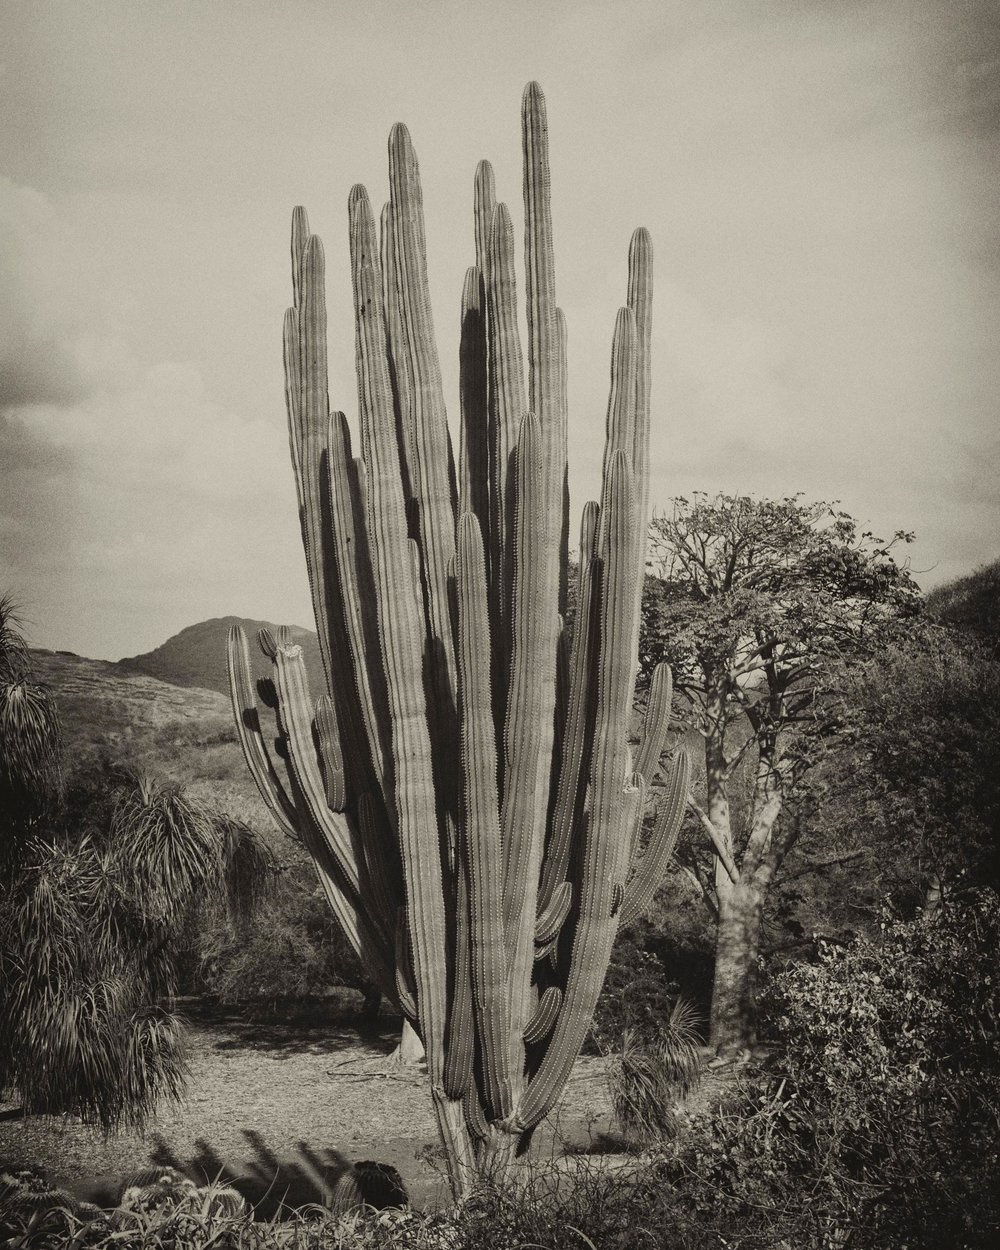 Saguaro cactus, oahu, Hawaii